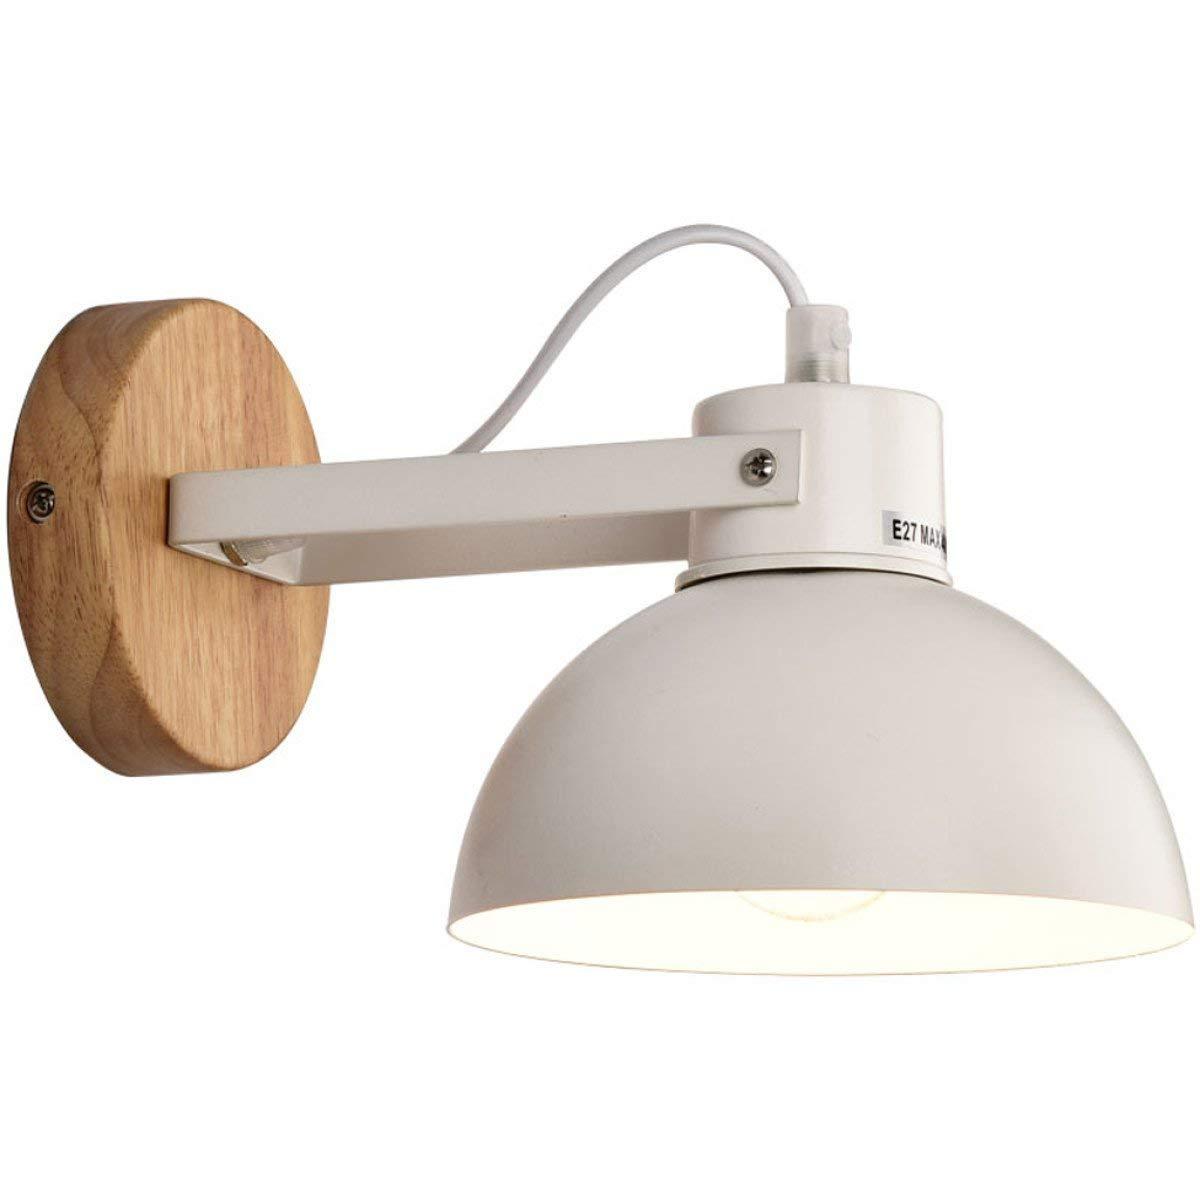 BXJ クリエイティブシンプルなウォールランプモダンウッドウォールランプE27光源 (Color : A) B07R8LFP77 A